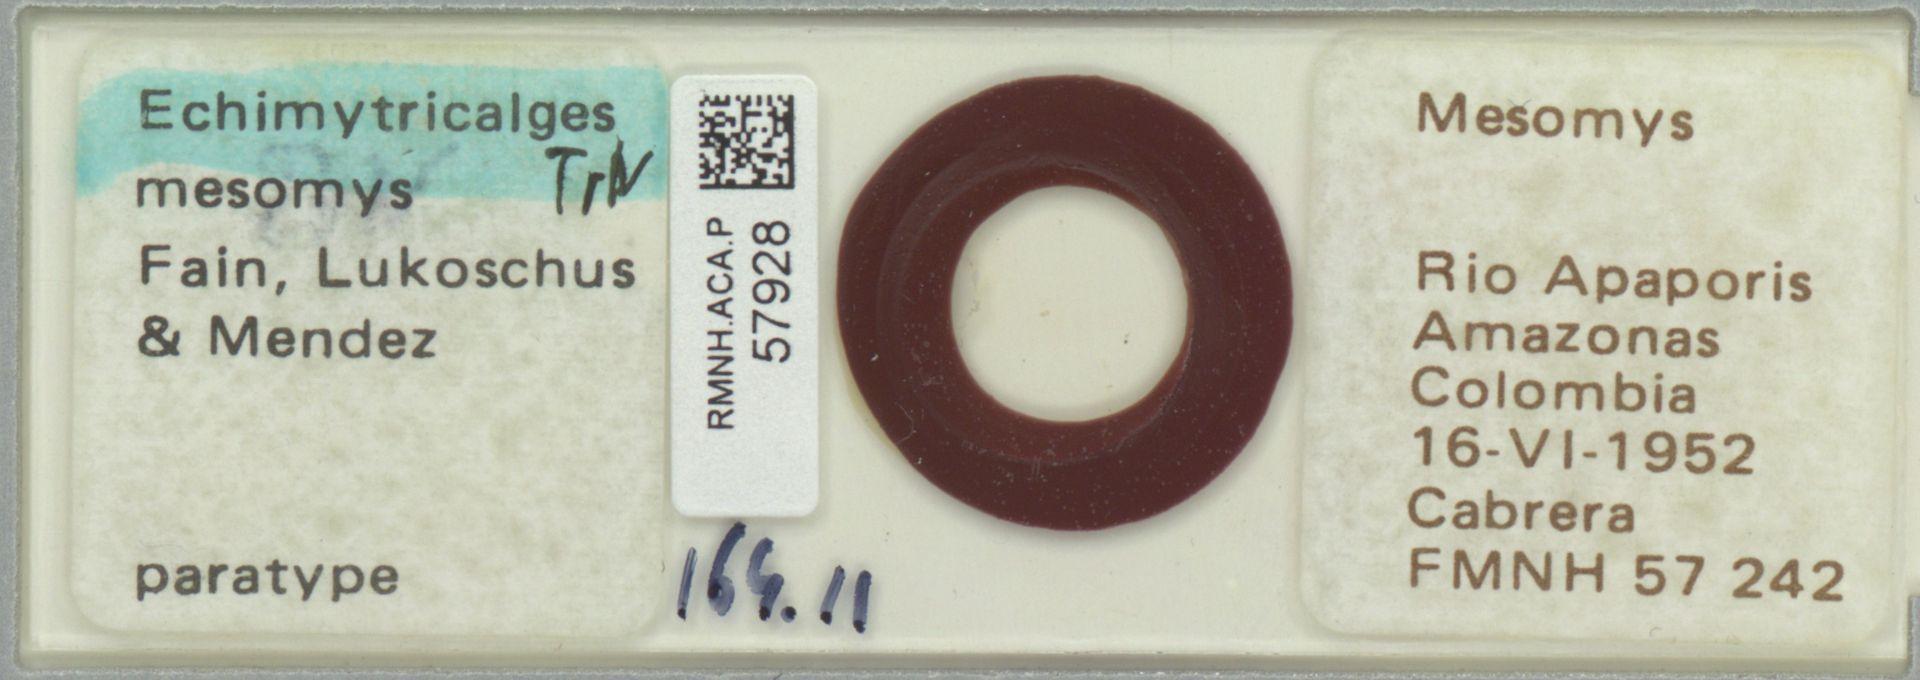 RMNH.ACA.P.57928 | Echimytricalges mesomys Fain, Lukoschus & Mendez